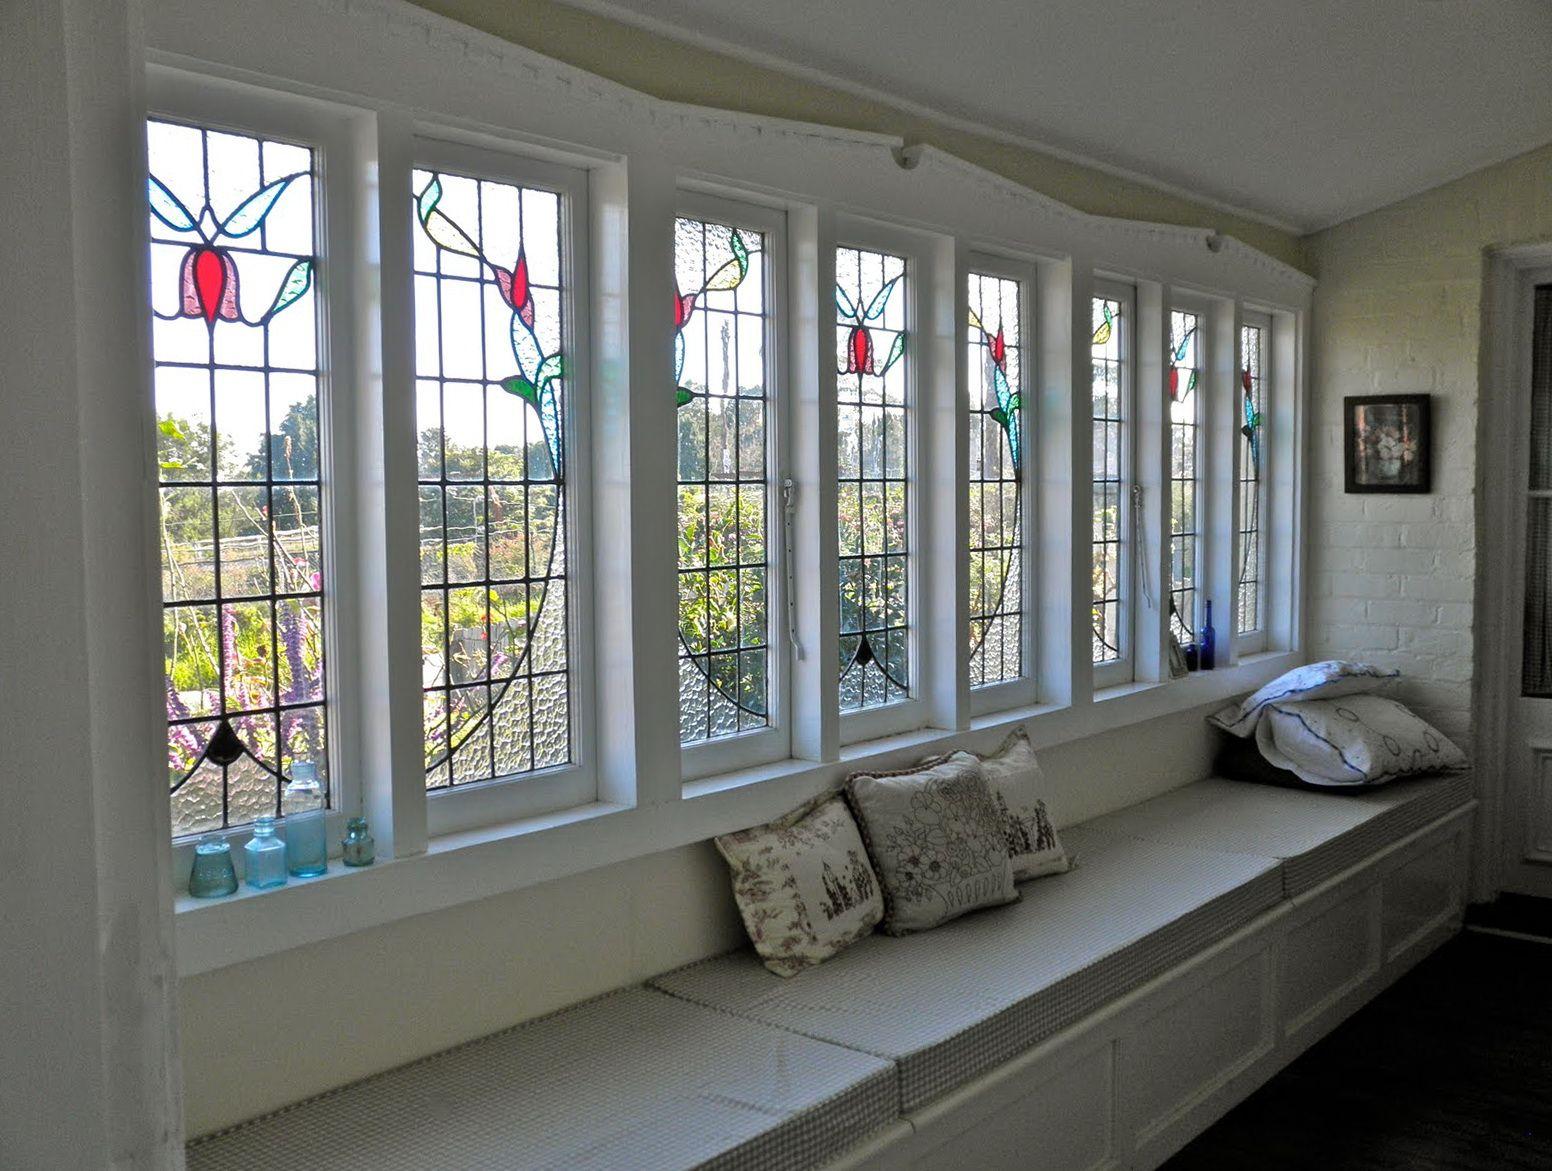 3 season porch window ideas  enclosed front porch ideas more  four square foundation repair